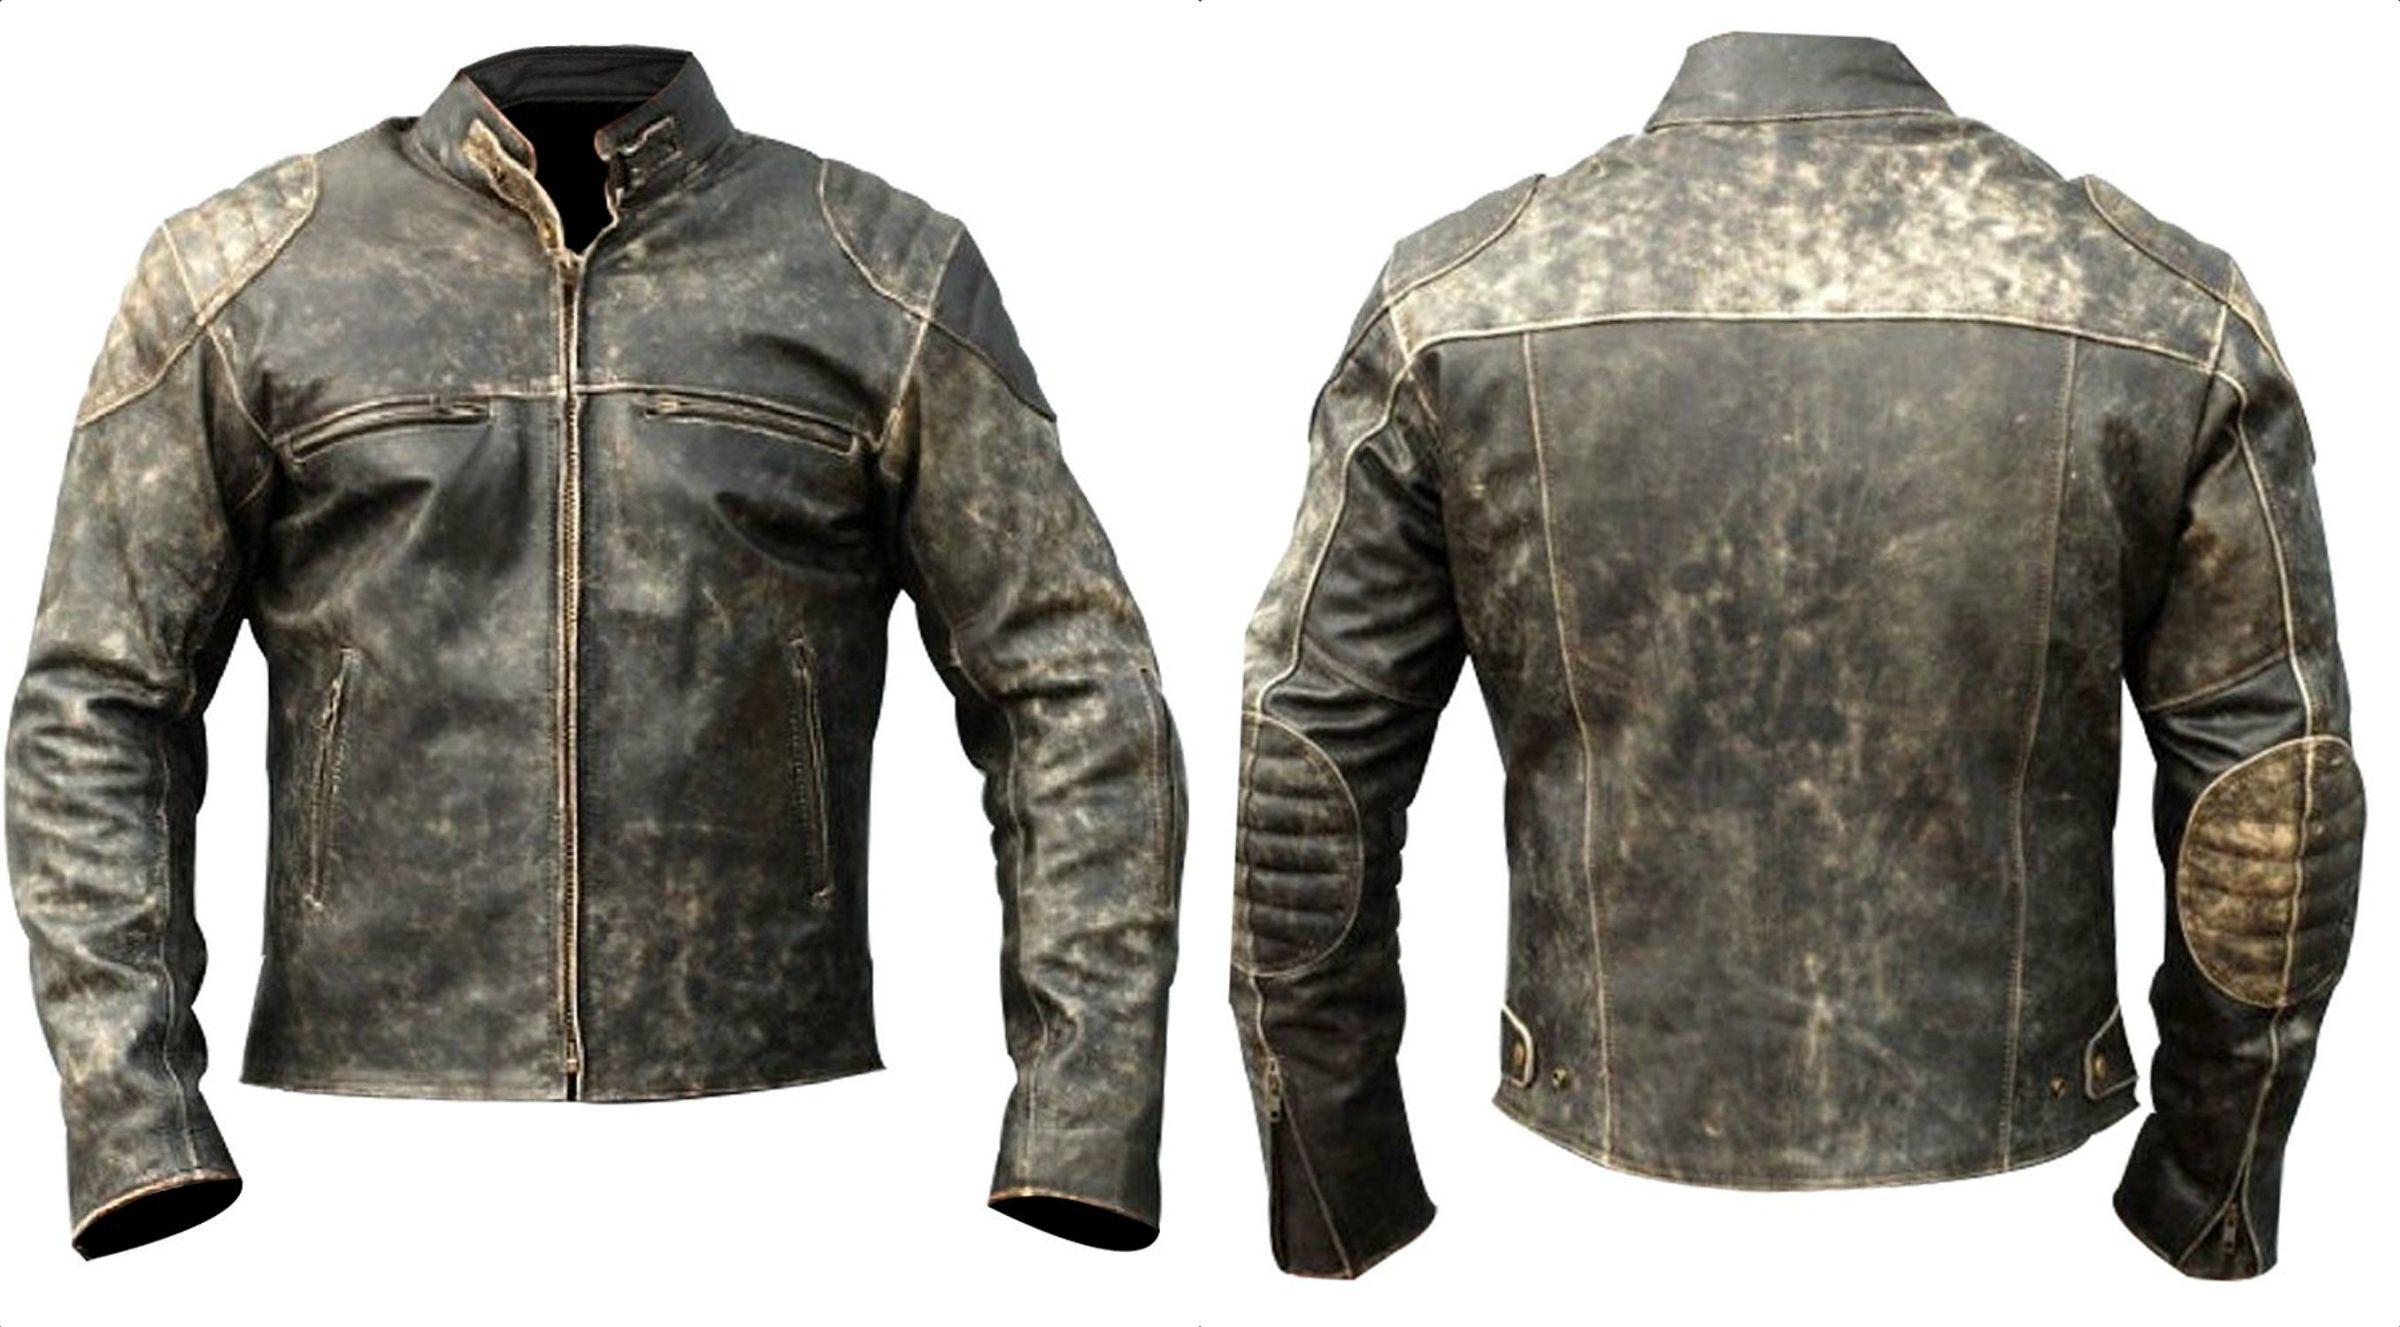 Antique Black Vintage Distressed Retro Leather Jacket Leather Jacket Vintage Biker Retro Motorcycle